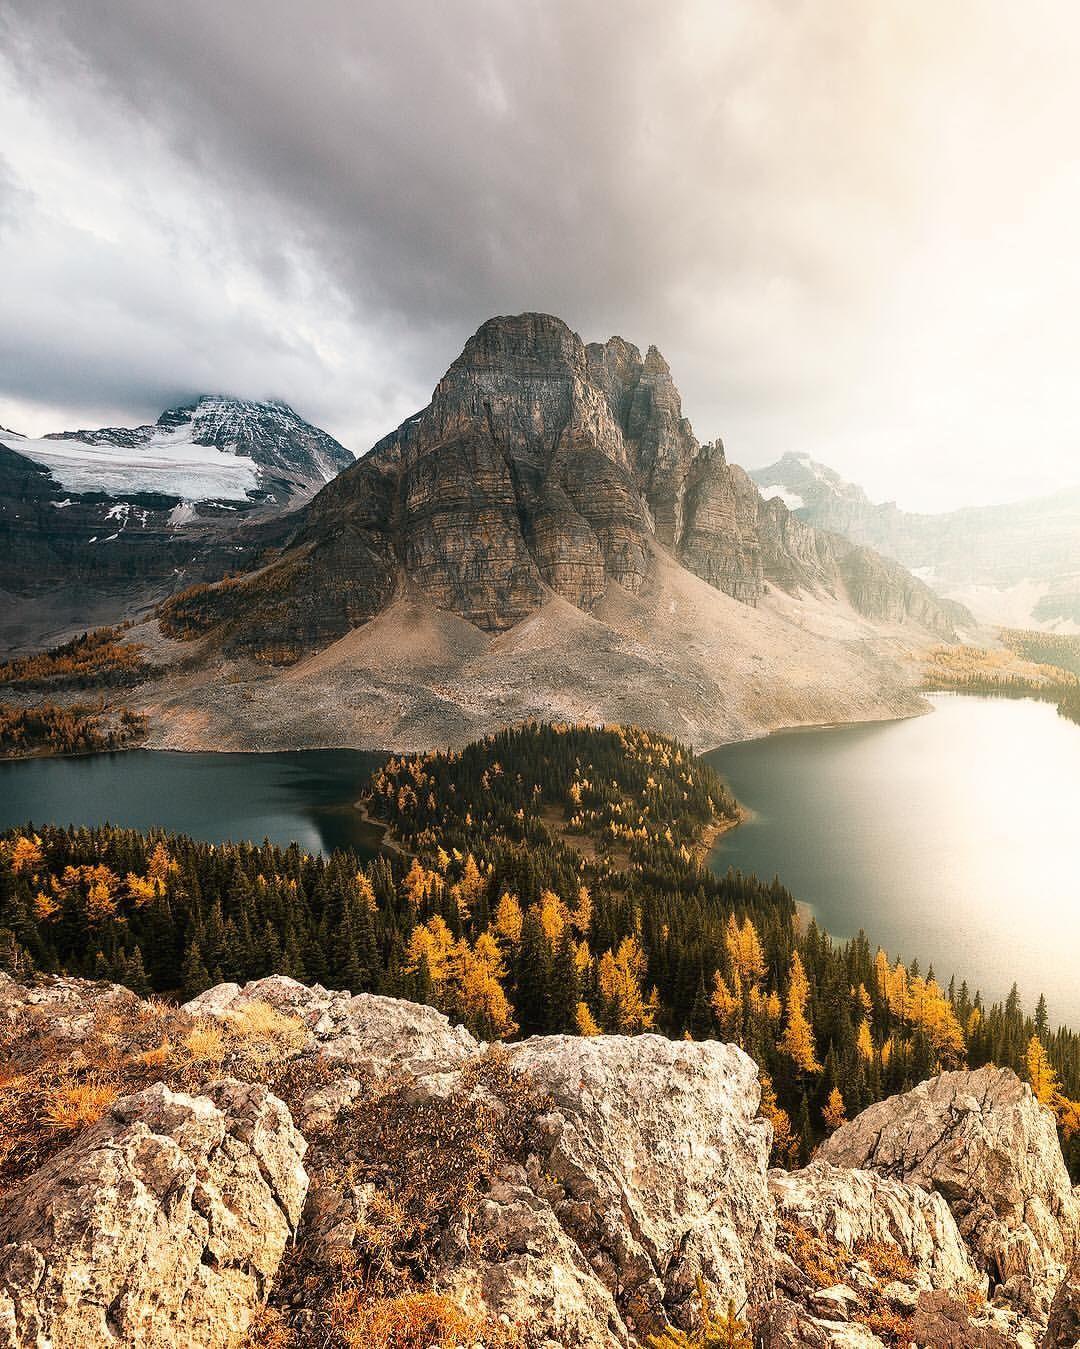 Mount Assiniboine Canadian Rockies Outdoors Adventure